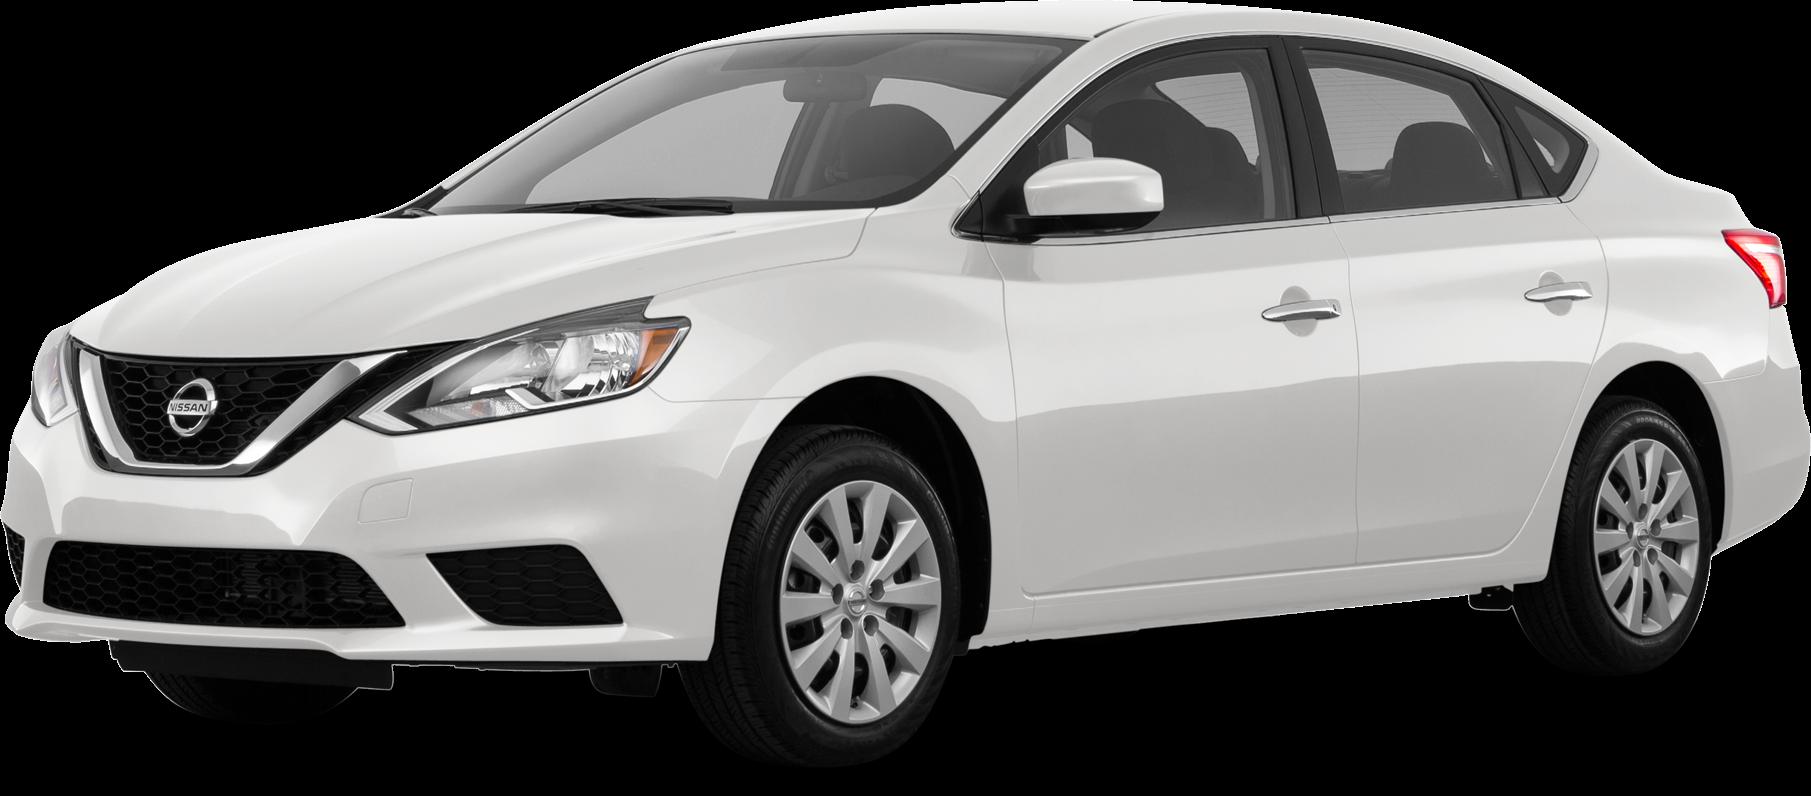 2016 Nissan Sentra Prices Reviews